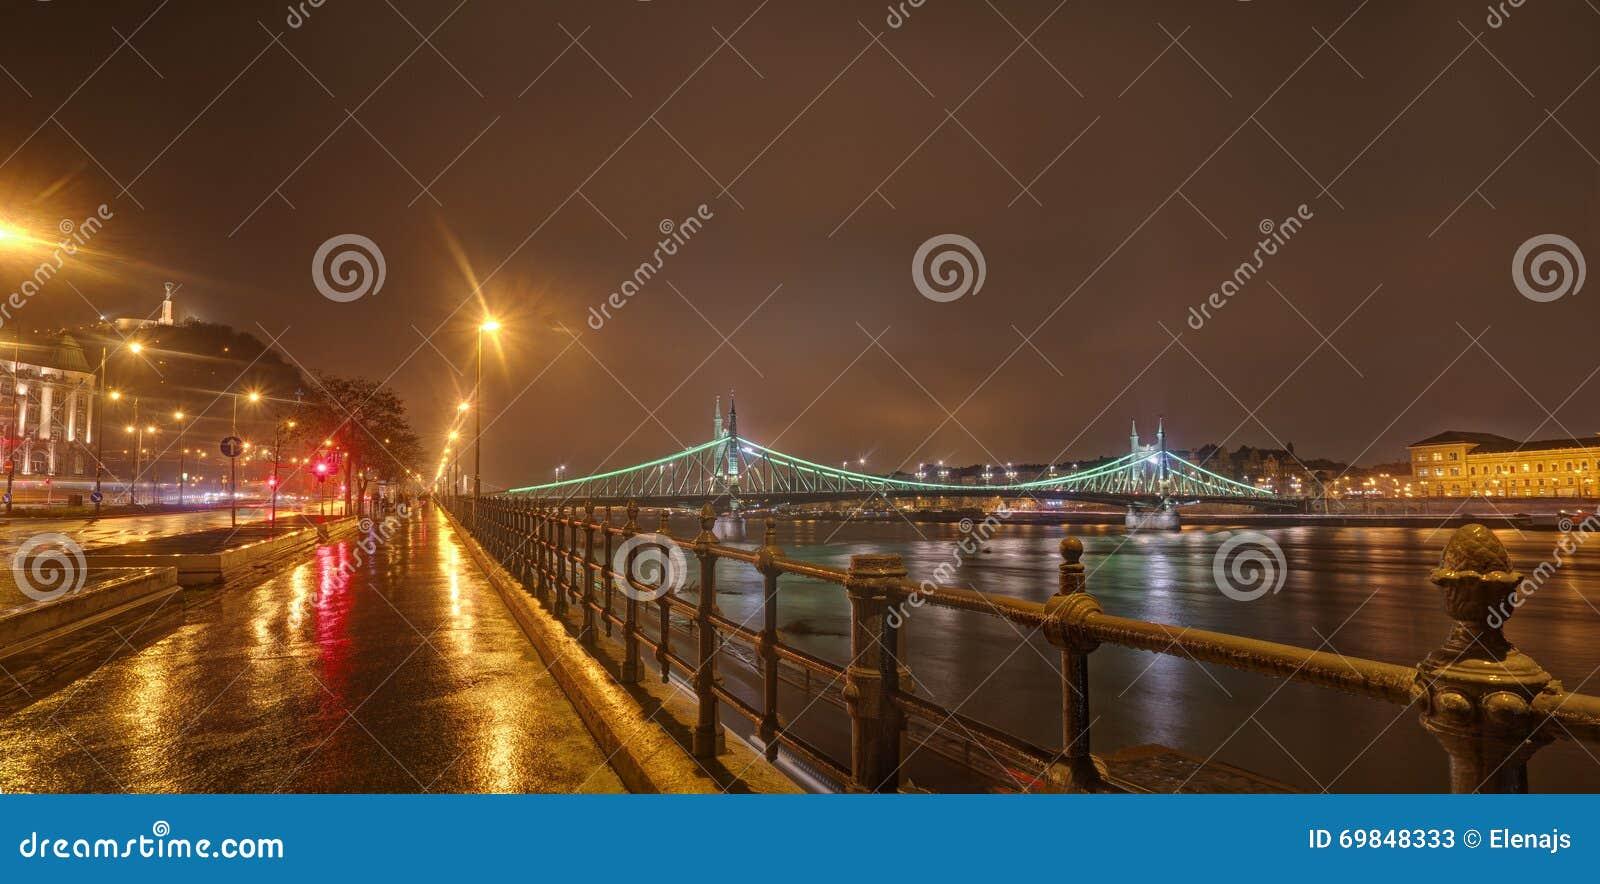 Hungary, Budapest, Liberty Bridge - night picture